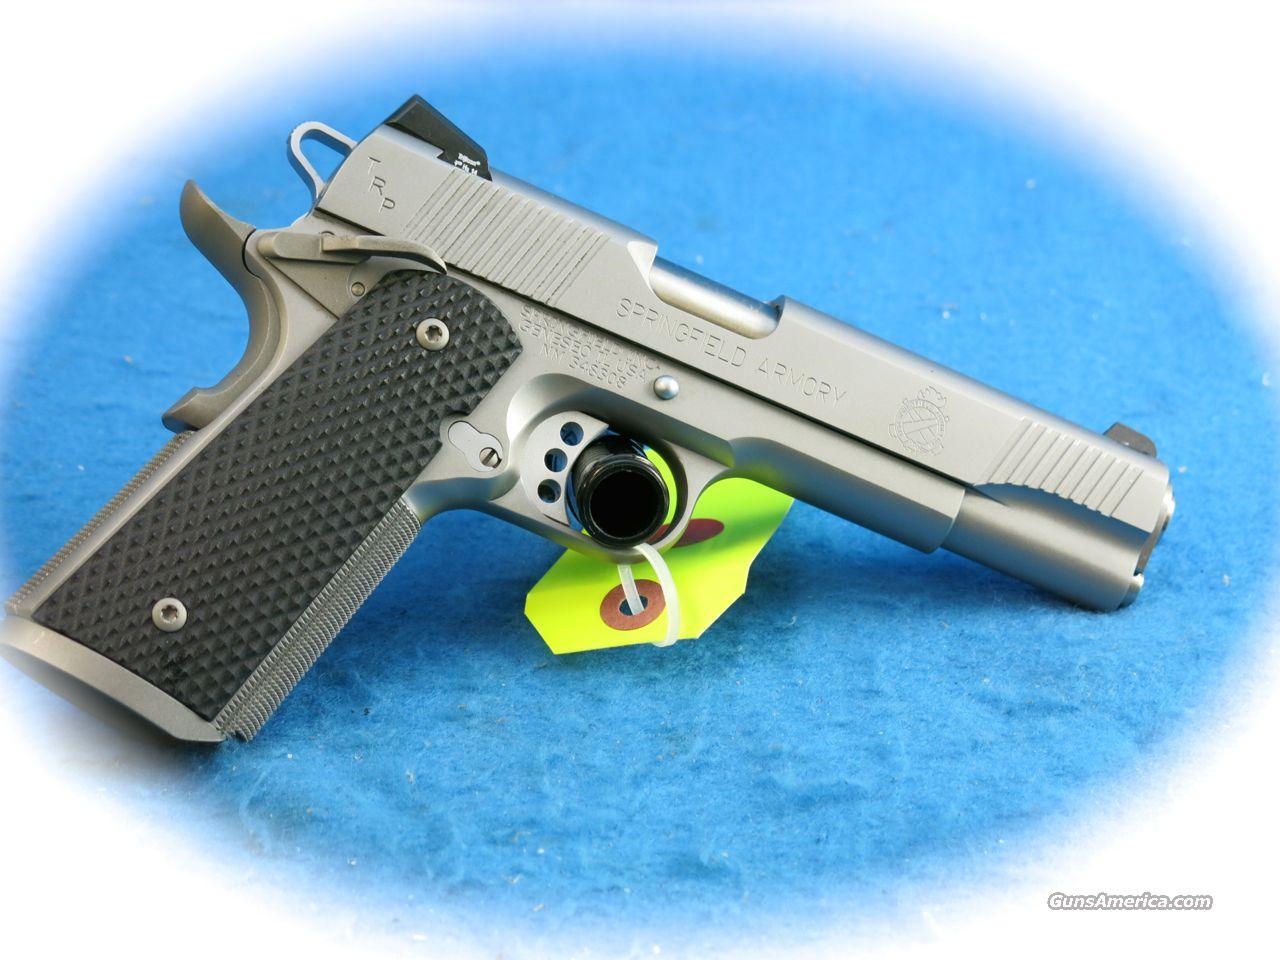 **SALE!!** Springfield Armory 1911 TRP SS .45 ACP Pistol **New**  Guns > Pistols > Springfield Armory Pistols > 1911 Type